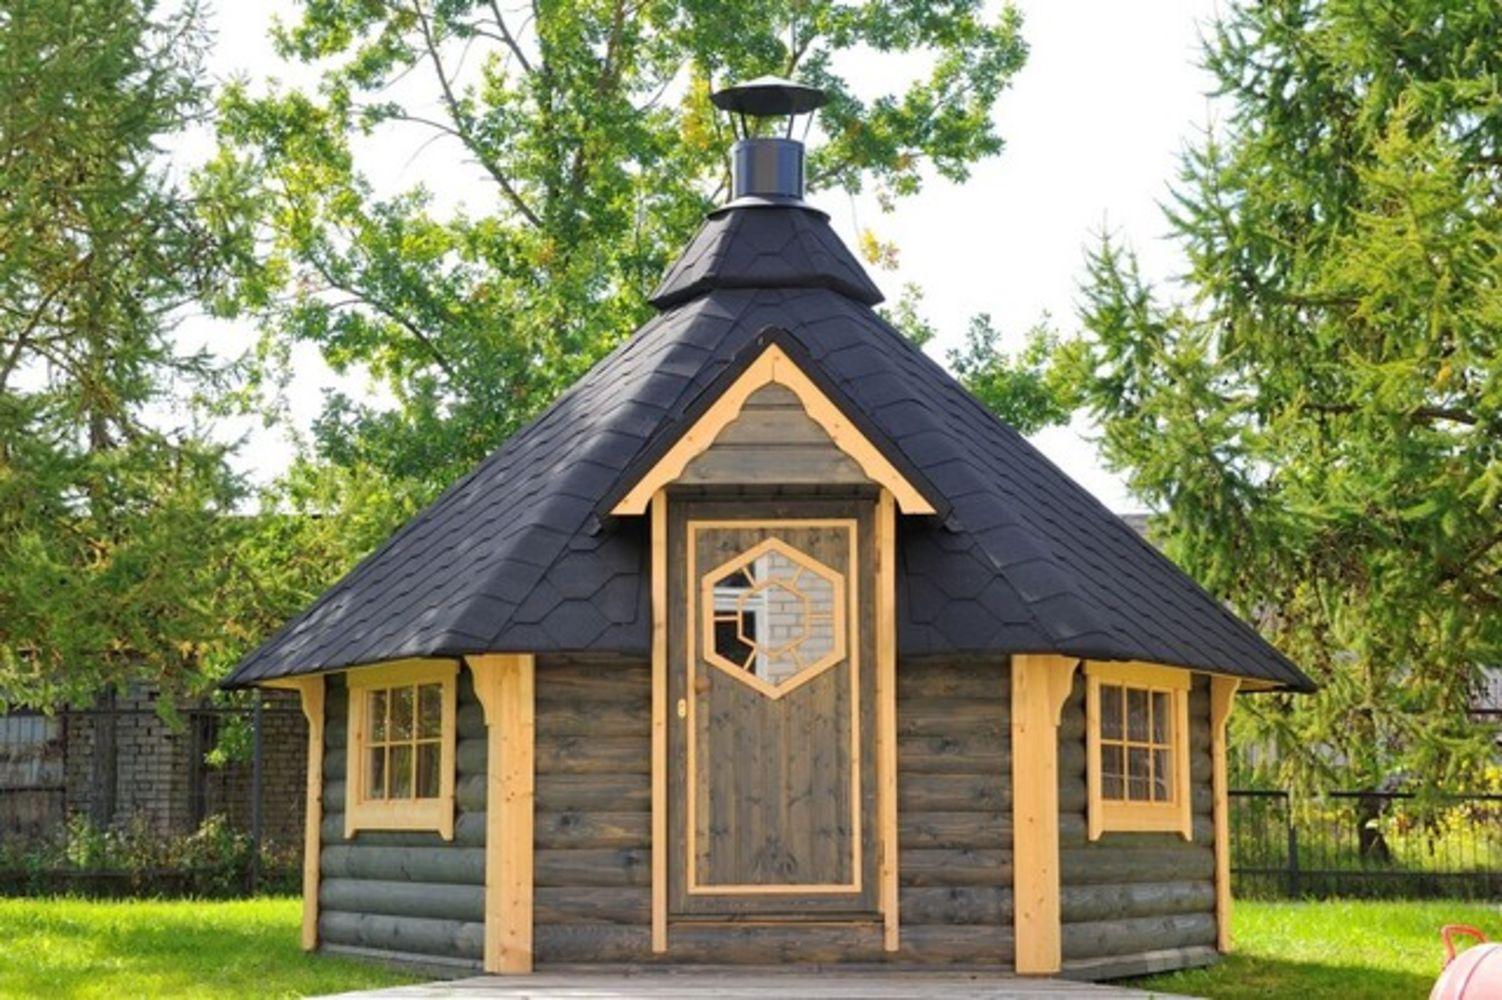 Luxury Garden Buildings & More: Cabins, Saunas & Hot Tubs, Plus an Exclusive Range of Rattan Garden Furniture & Patio Heaters